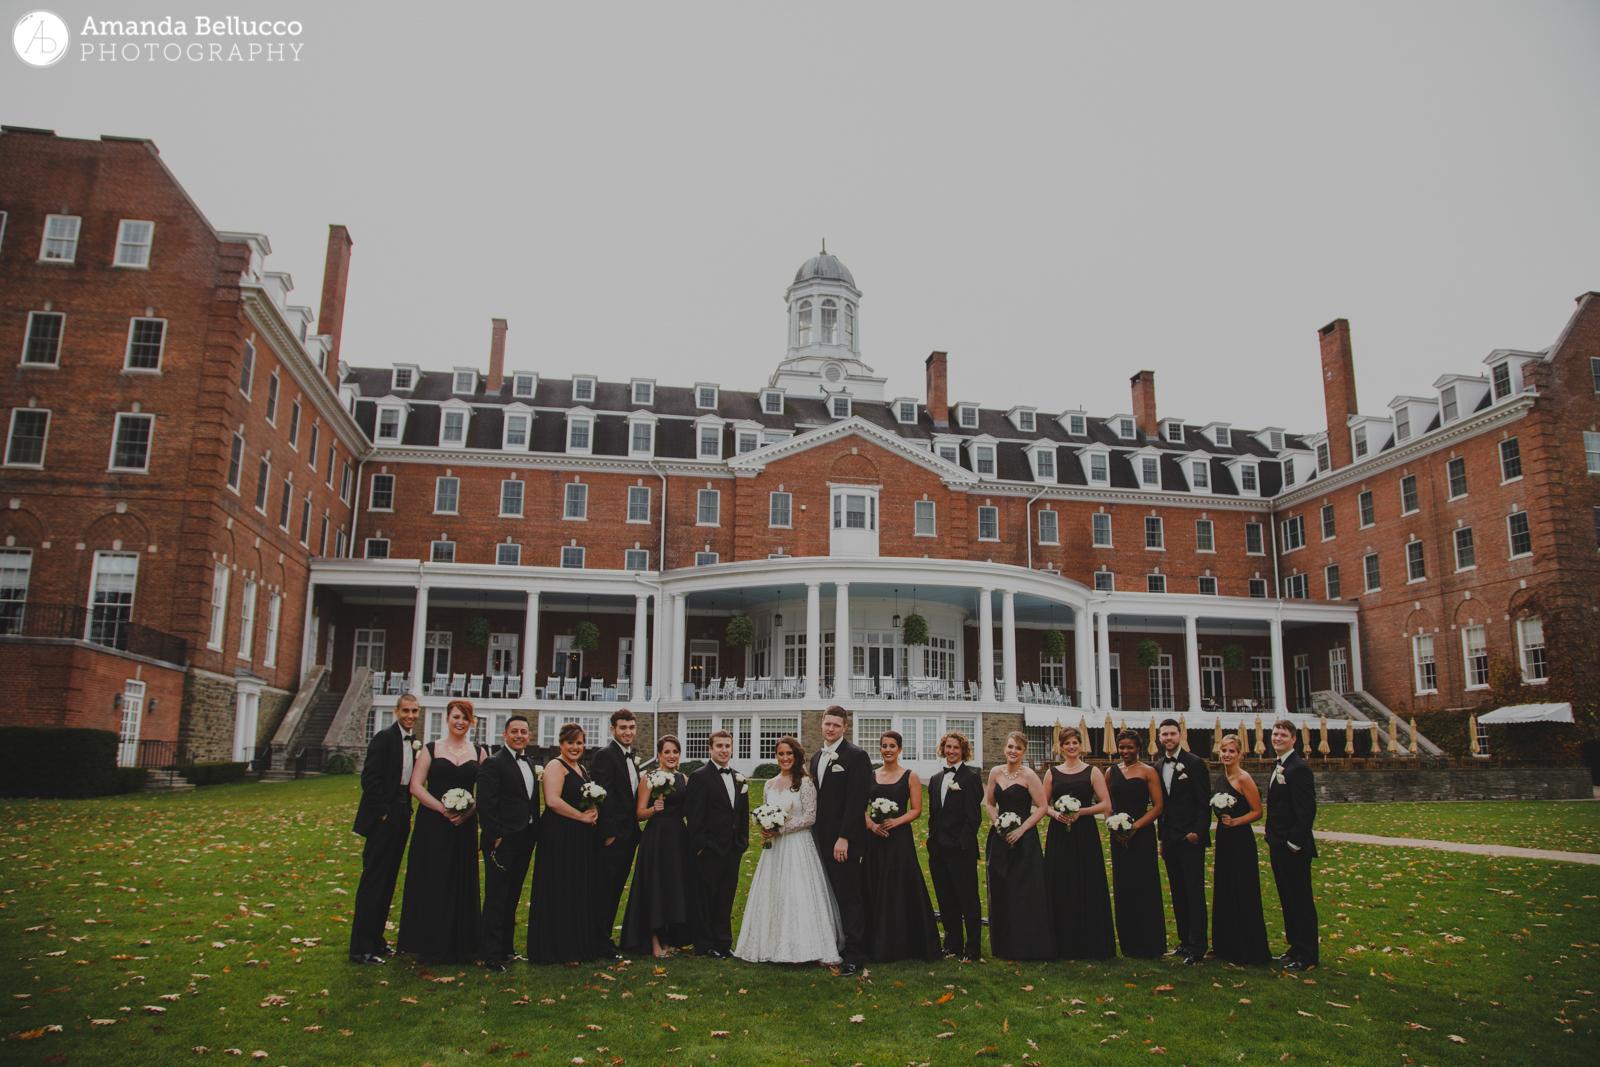 syracuse-rochester-fine-art-wedding-photographer-70.JPG